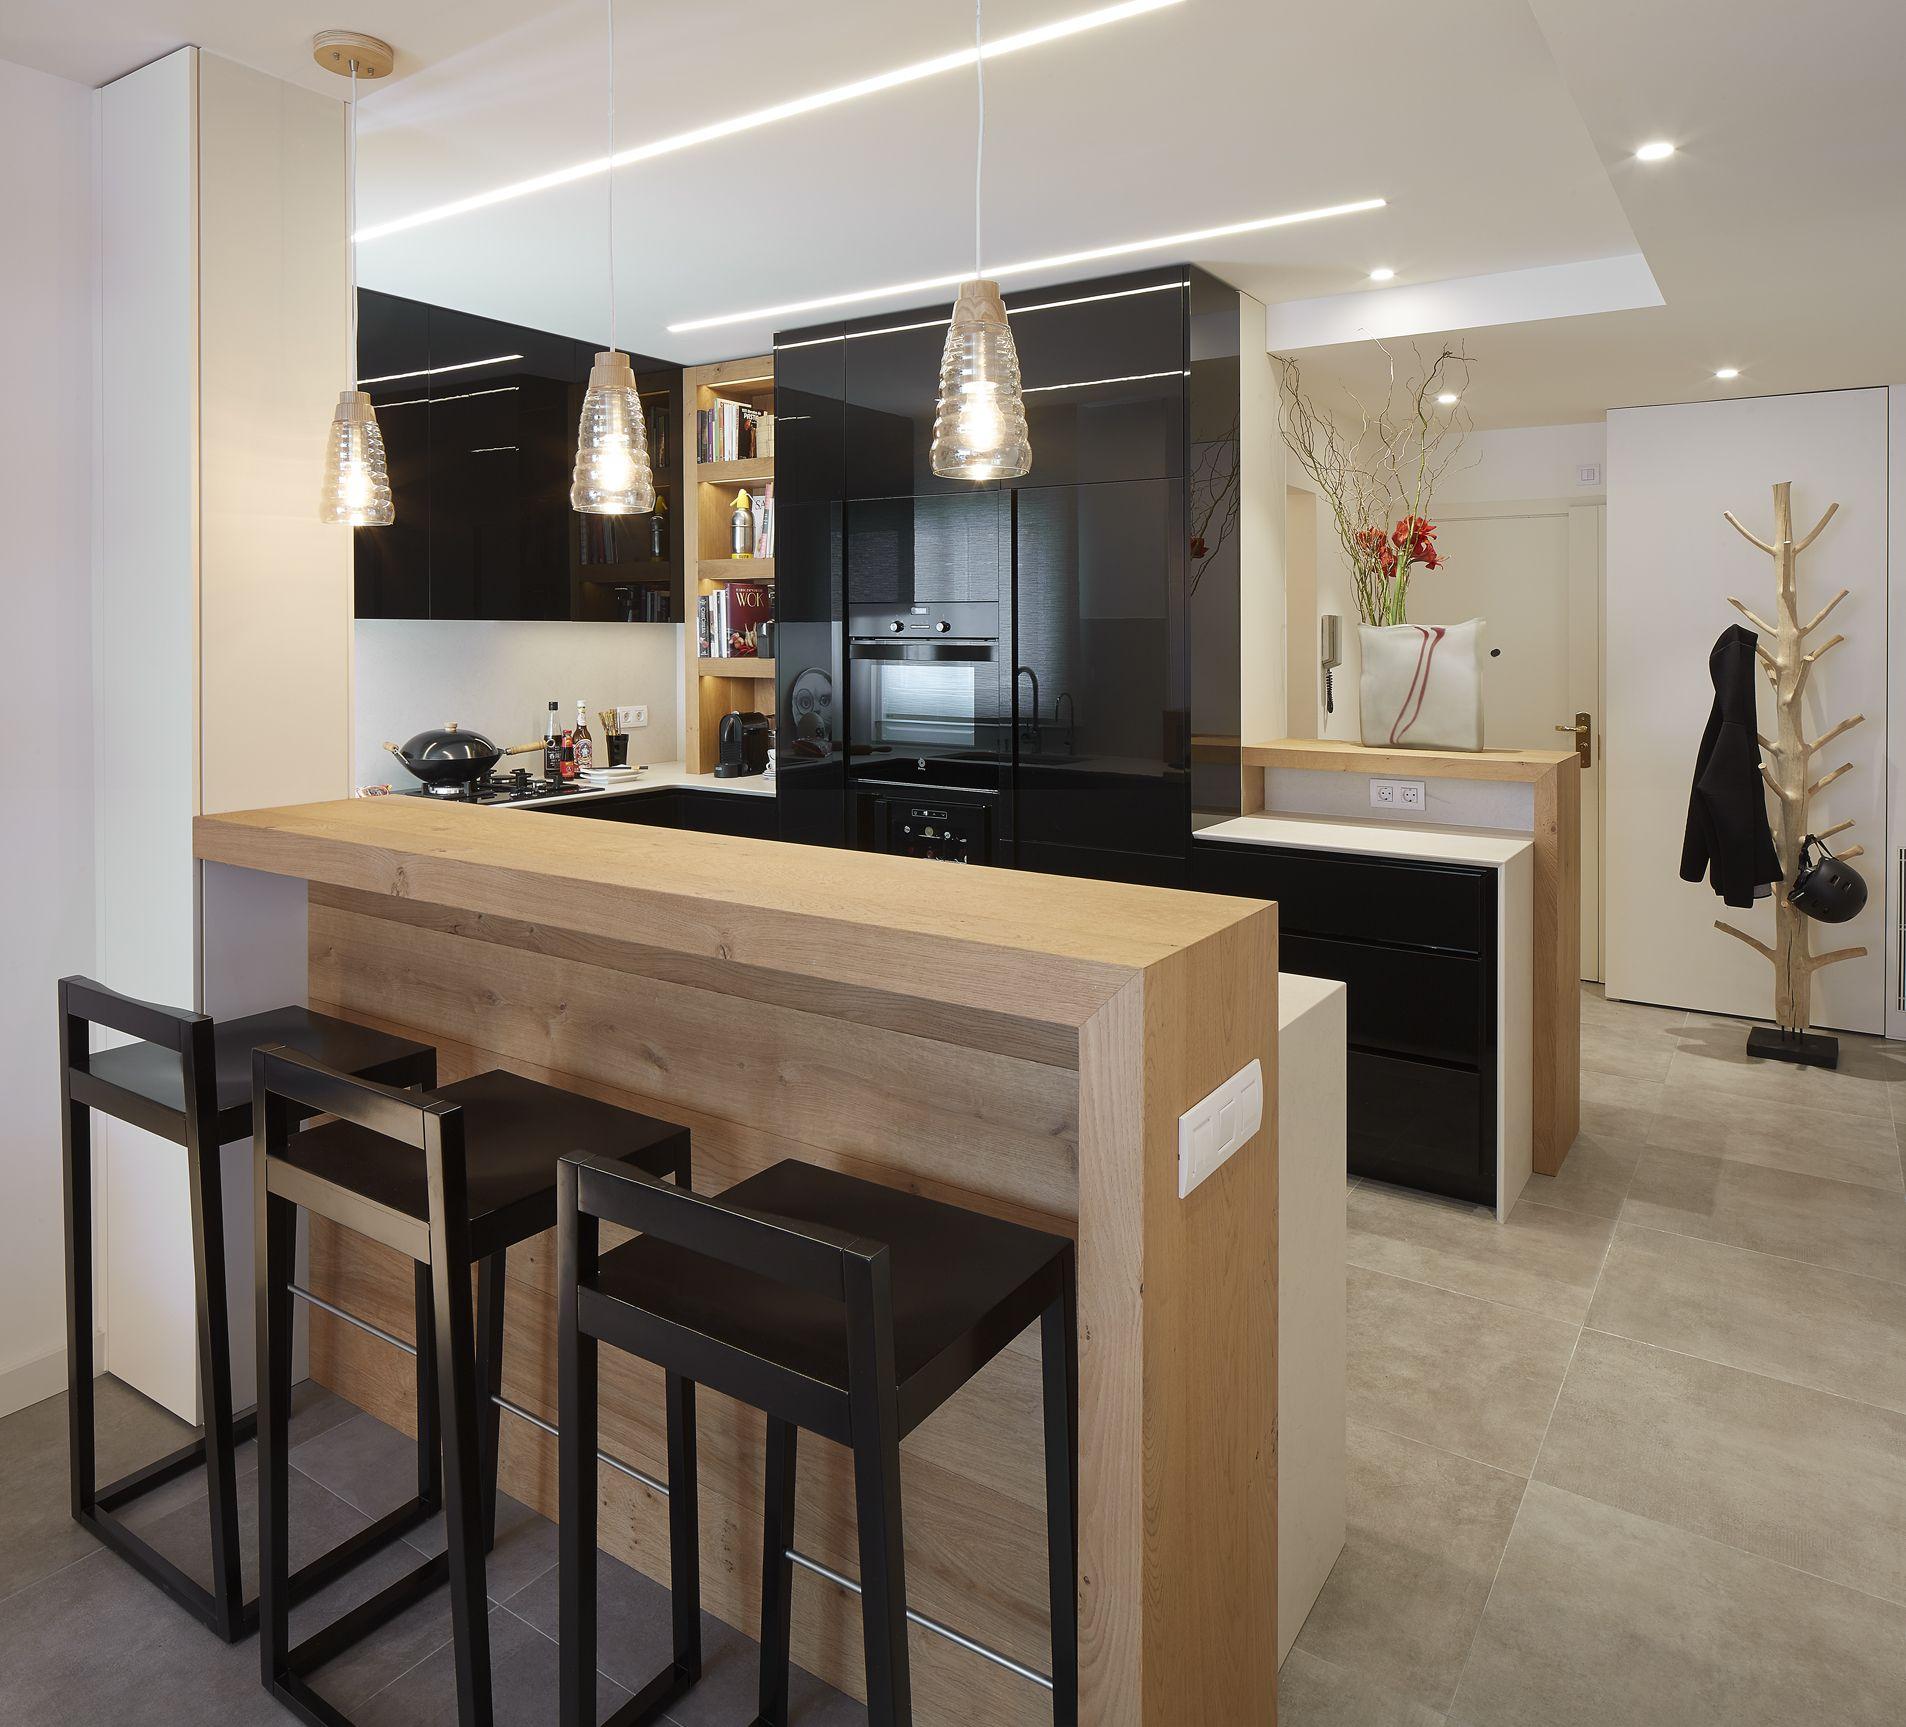 Molins interiors arquitectura interior interiorismo for Barra cocina madera